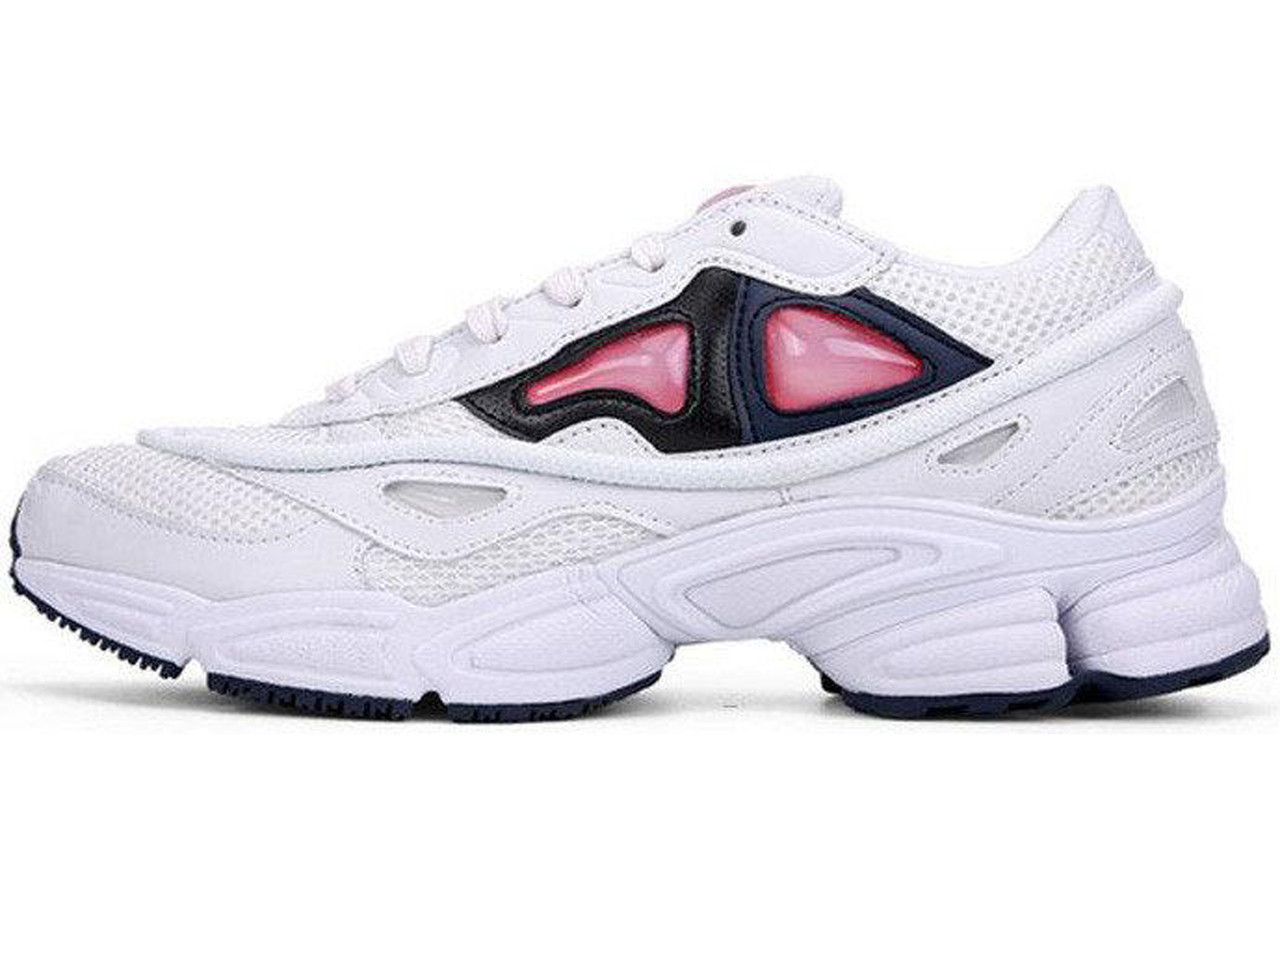 fc89c73c Мужские кроссовки Adidas Raf Simons Osweggo white : продажа, цена в ...